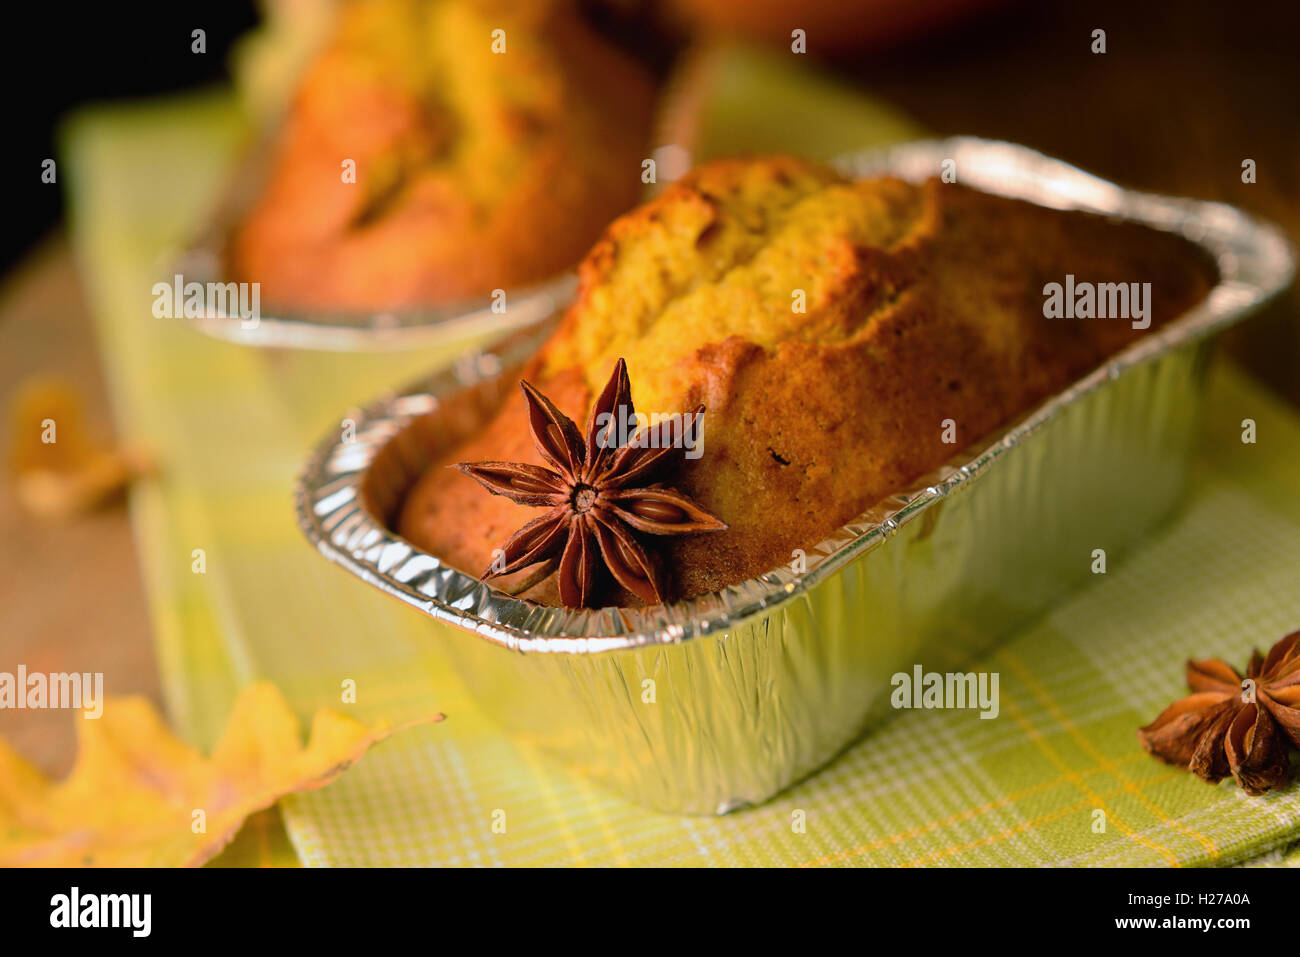 A home baked sweet rye pumpkin bread - Stock Image